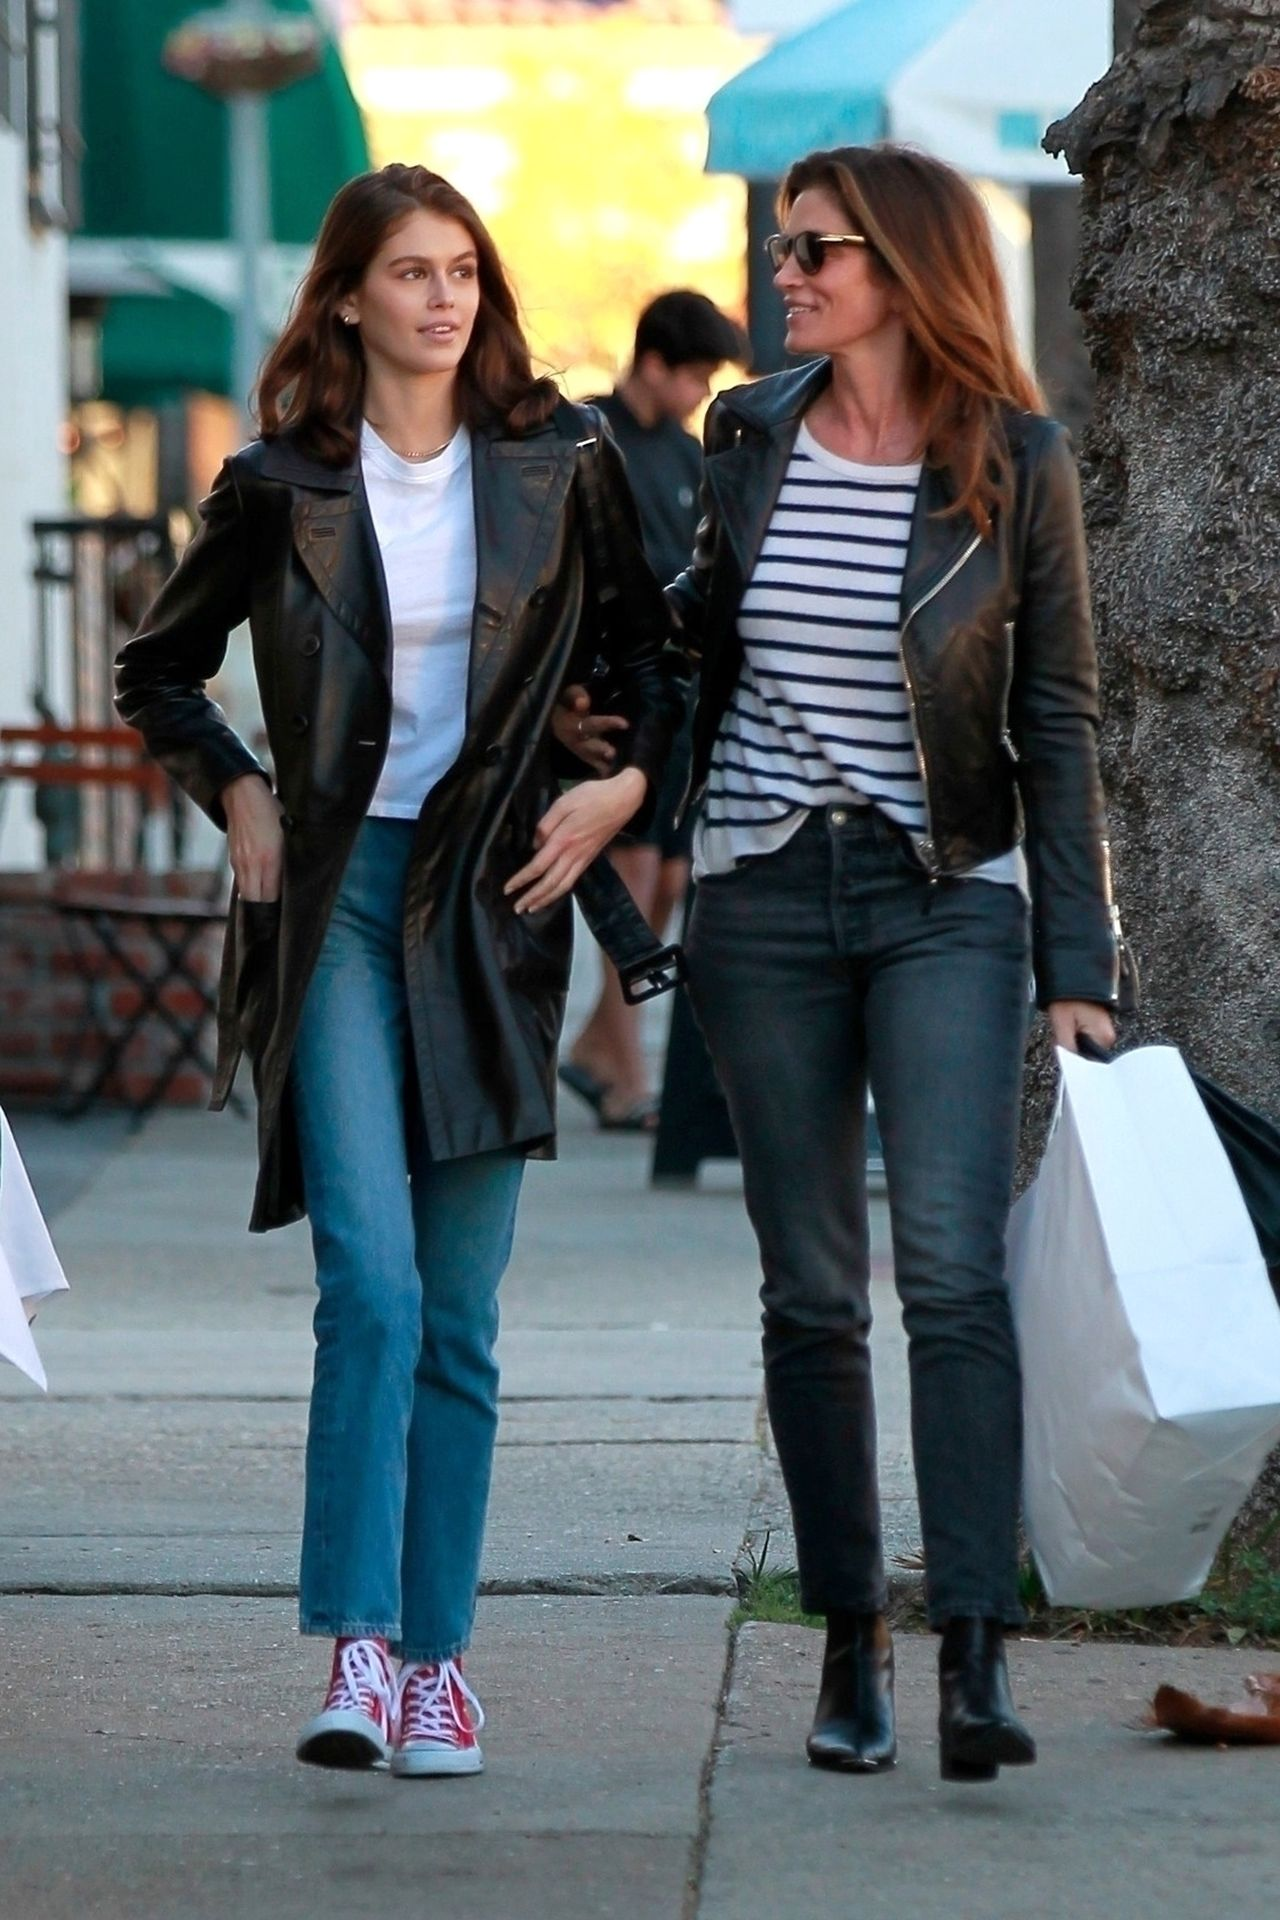 17-letnia Kaia Gerber z mamą, Cindy Crawford na zakupach (ZDJĘCIA)